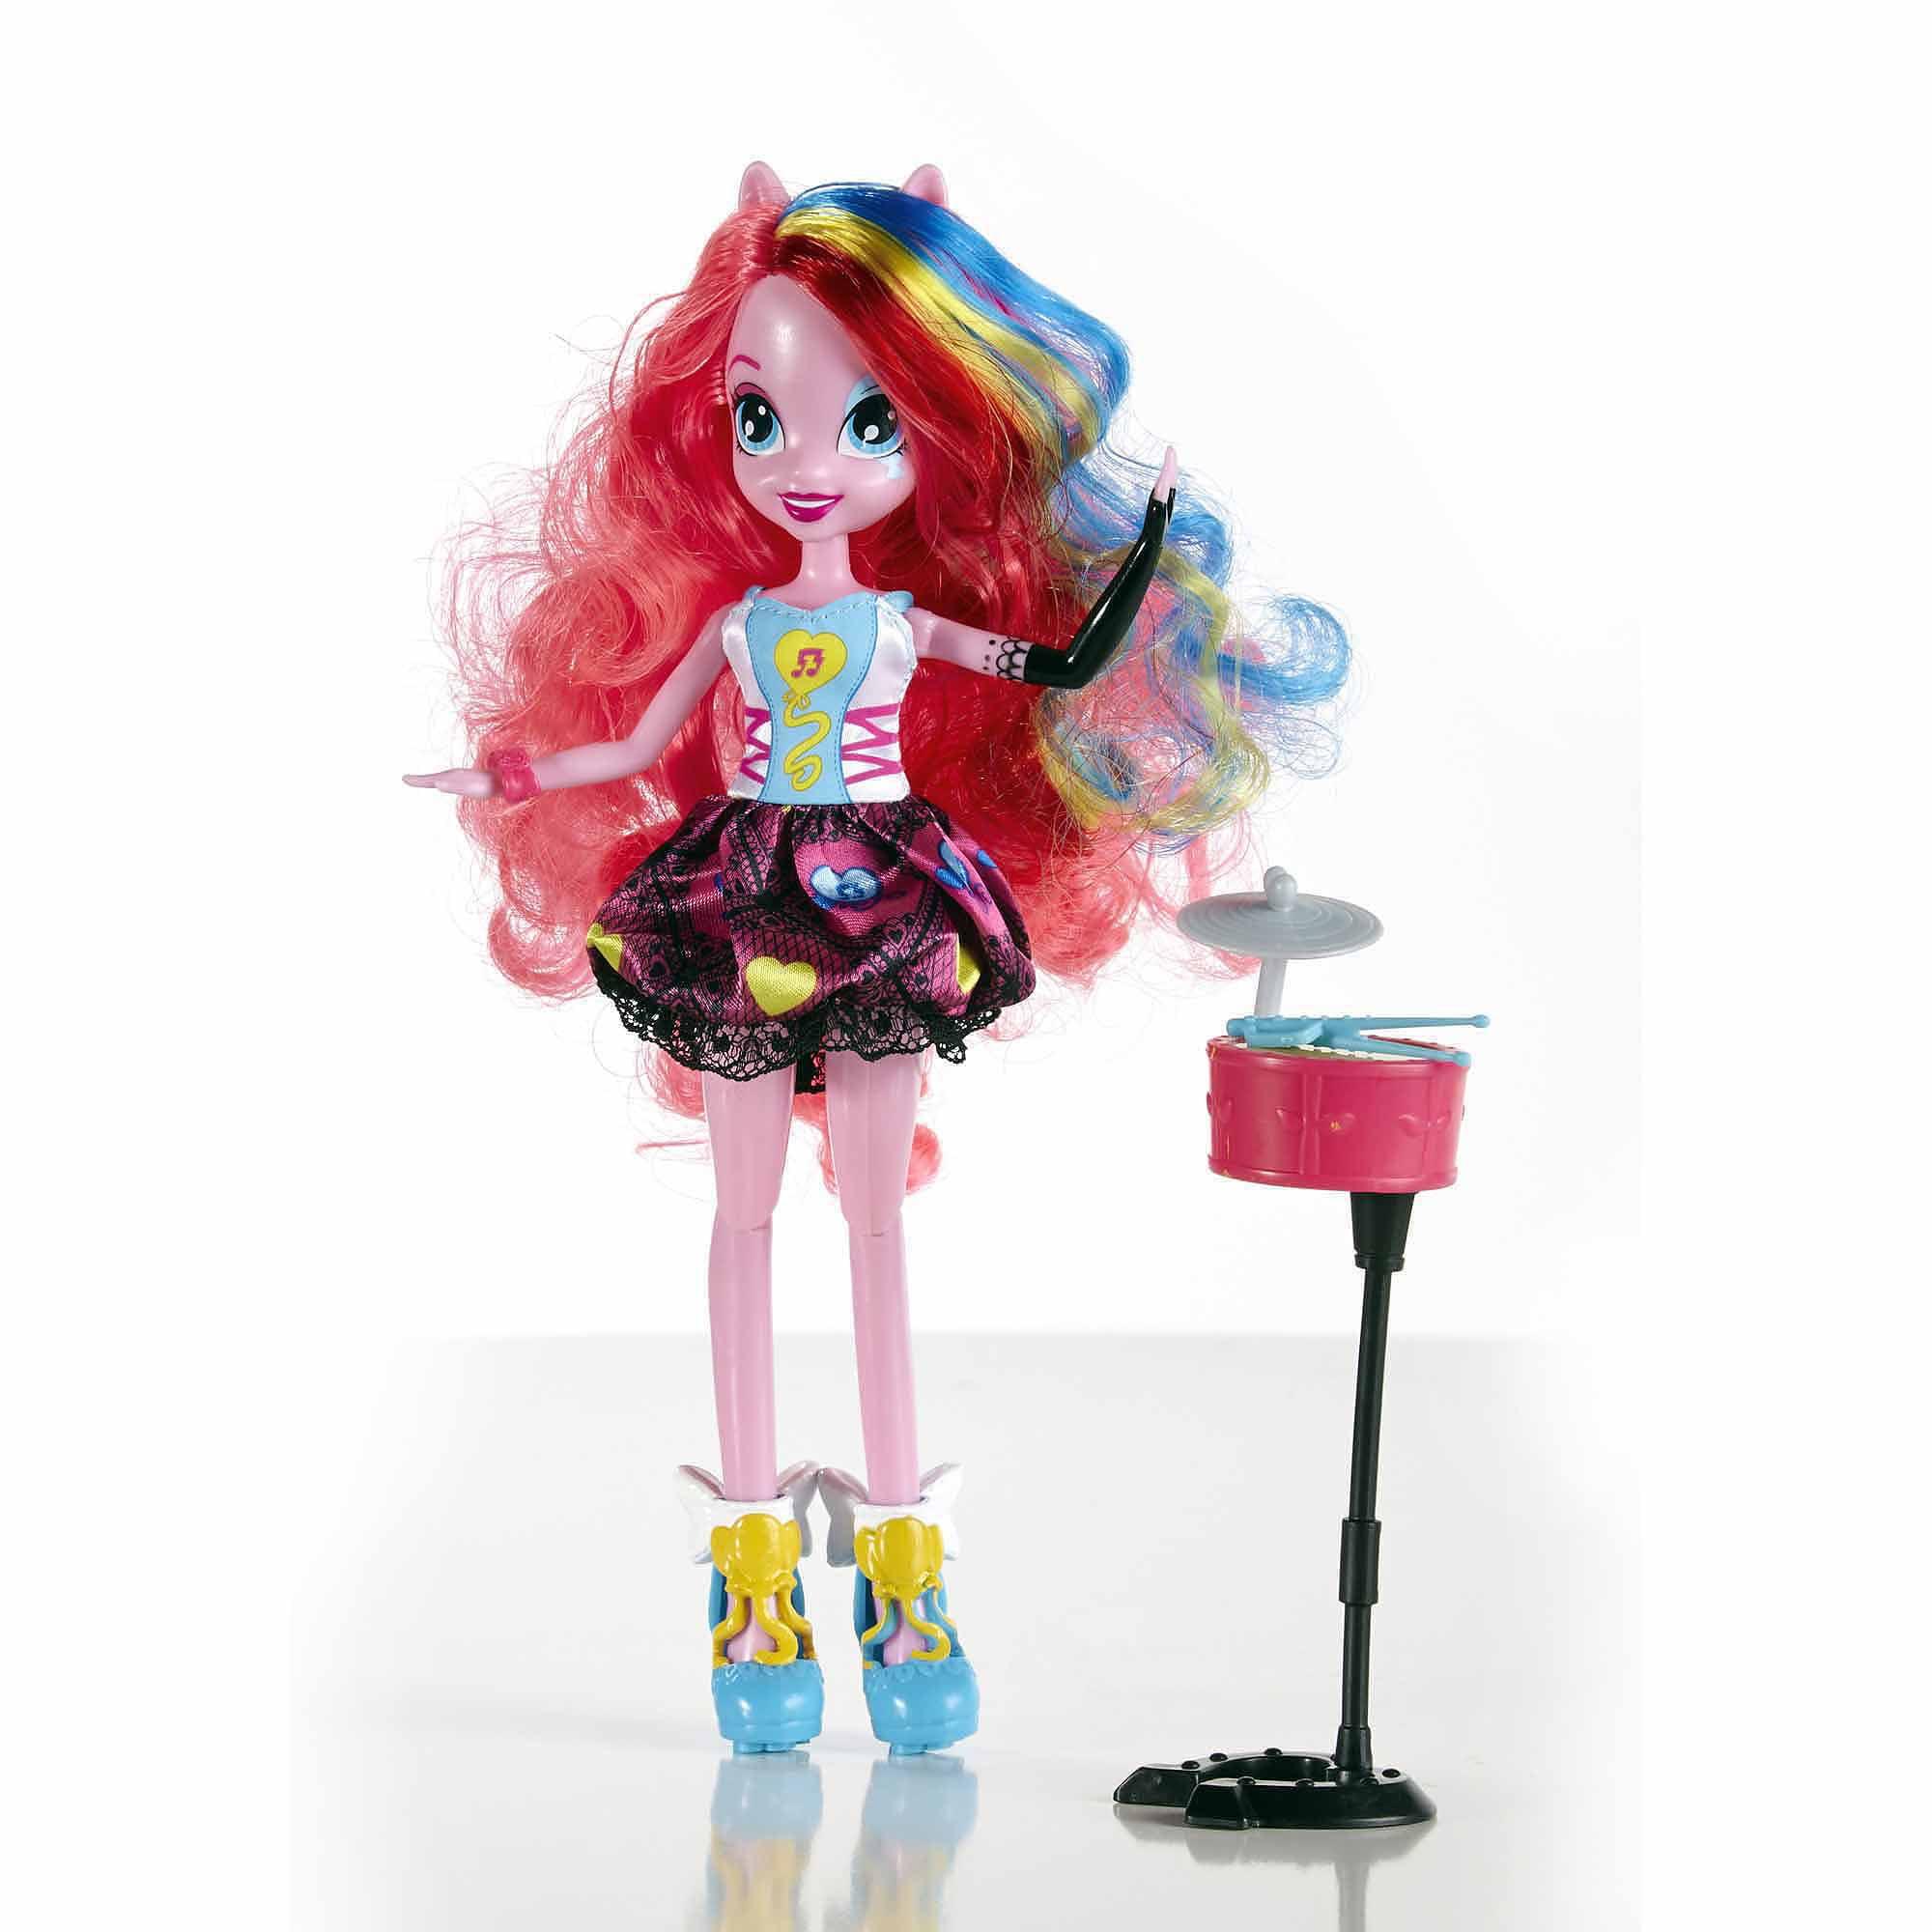 My Little Pony Equestria Girls Singing Pinkie Pie Doll by Hasbro, Inc.